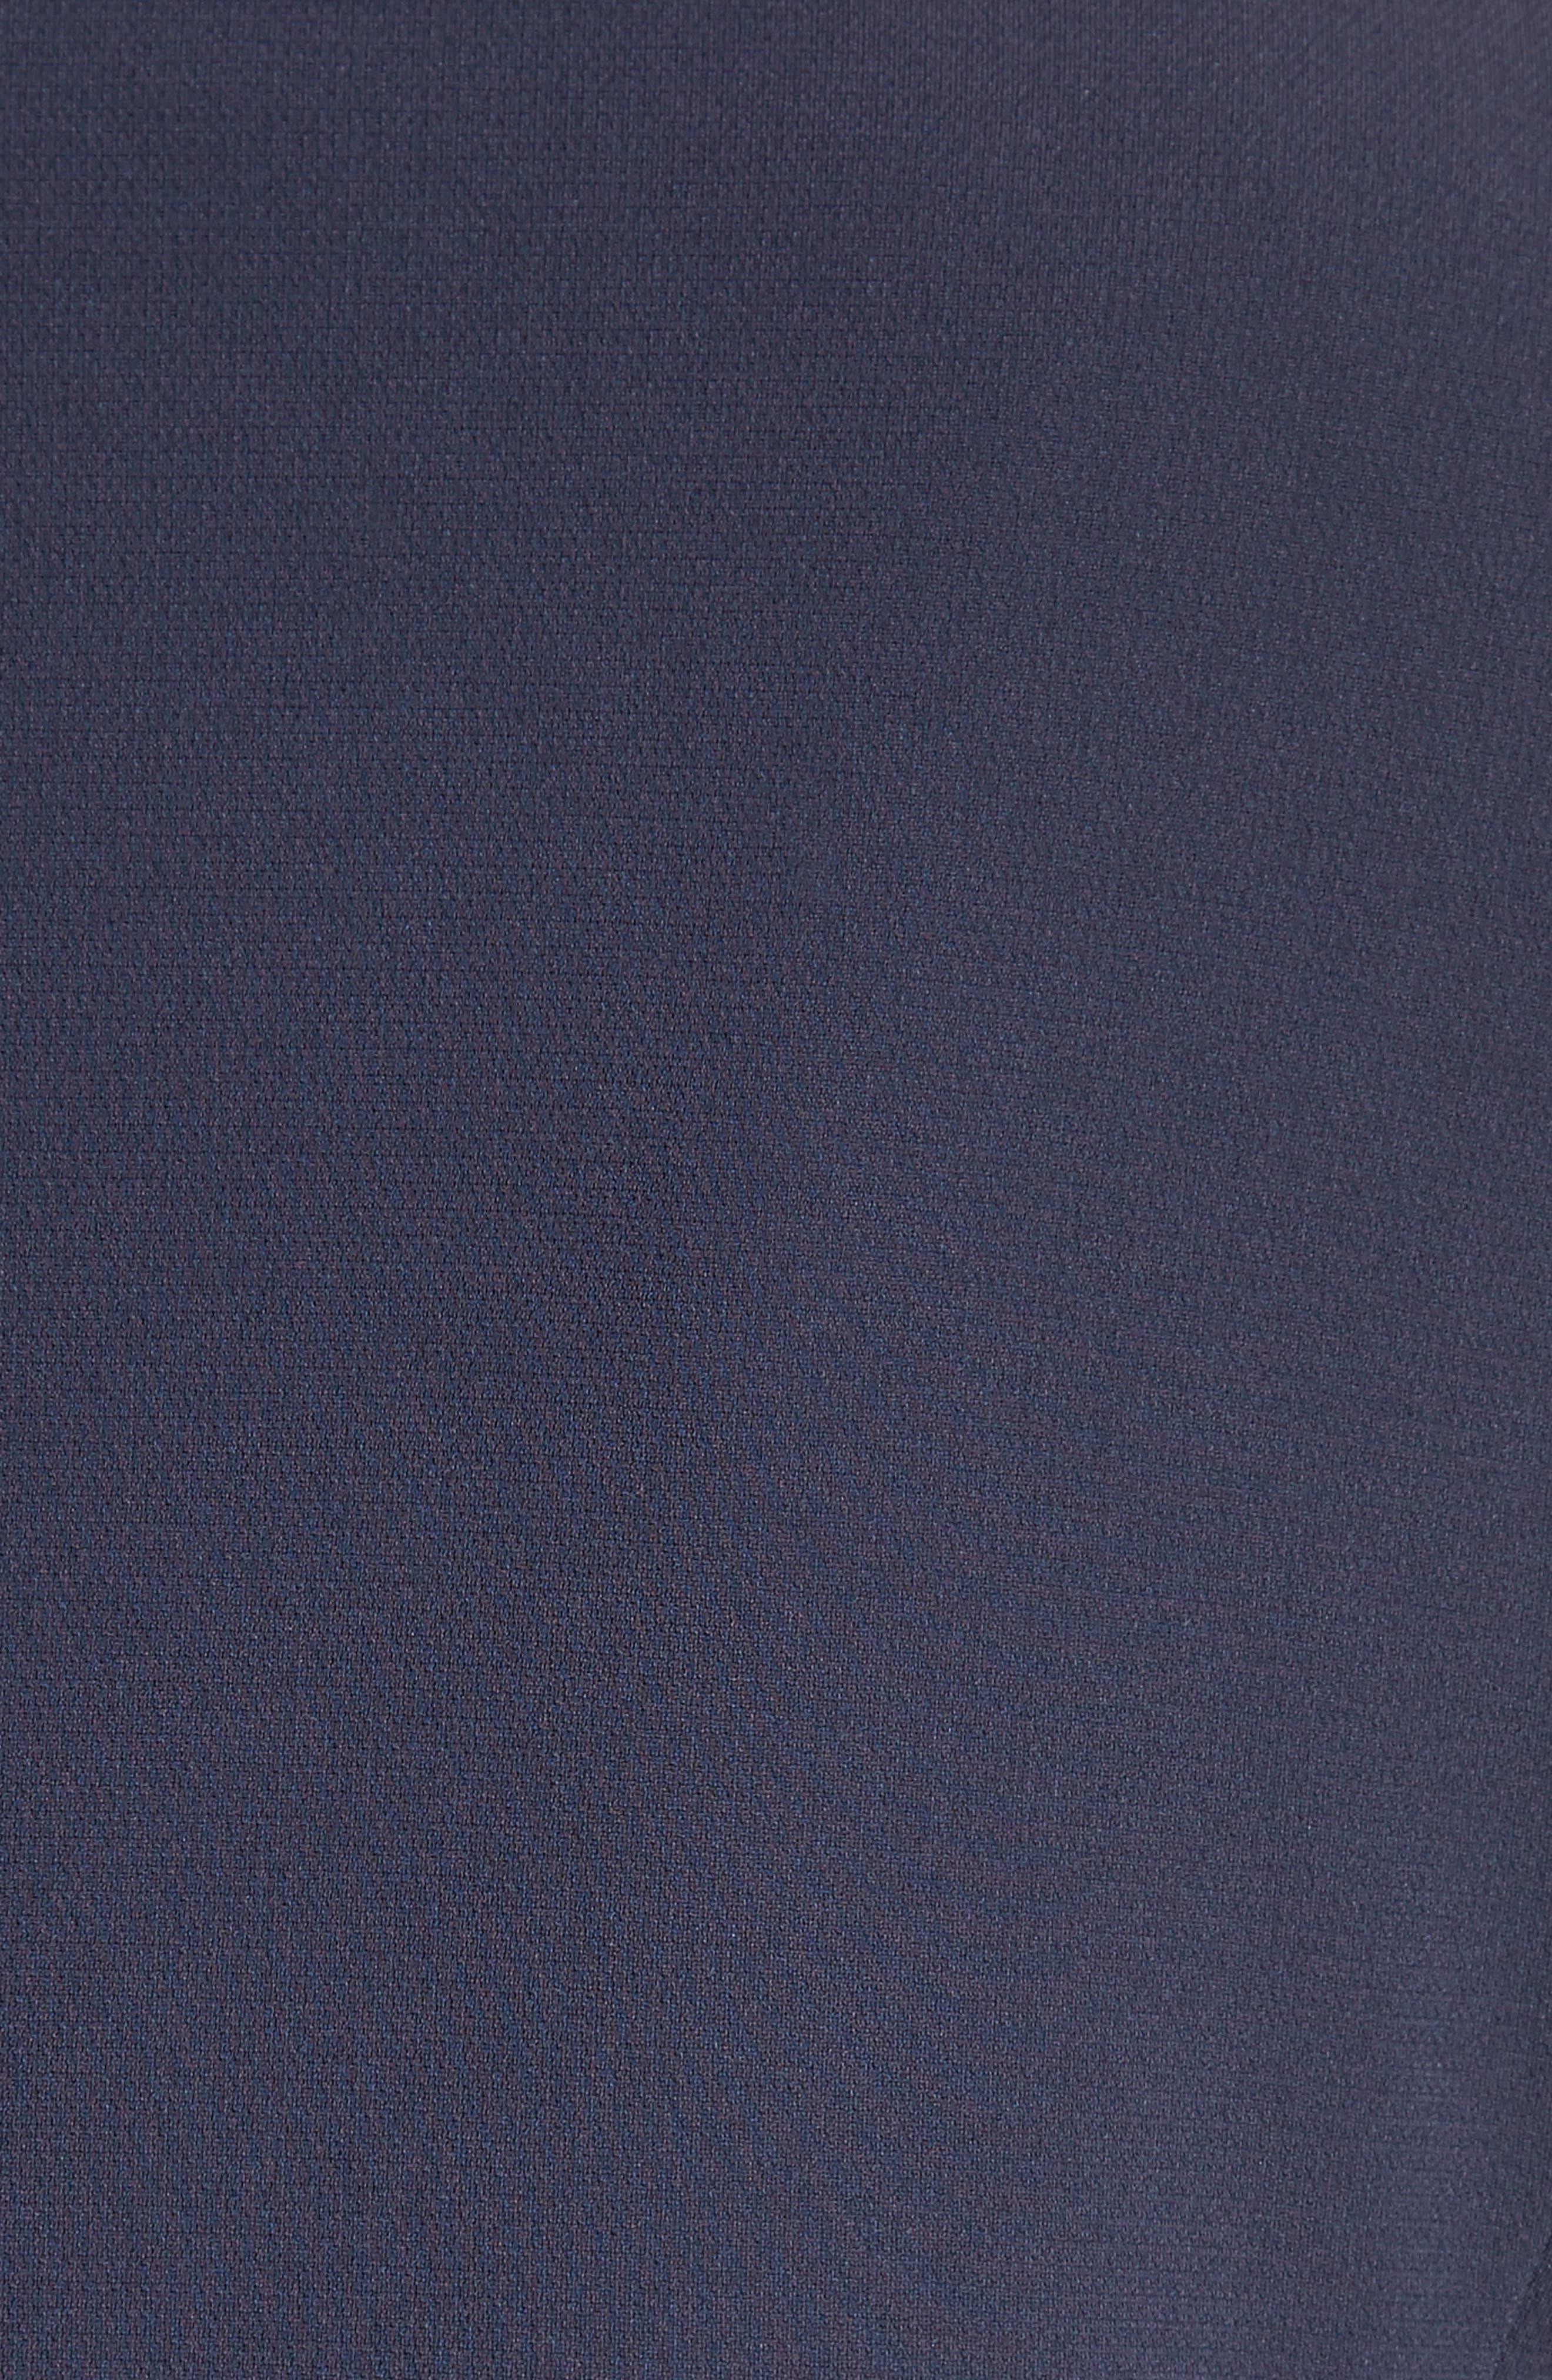 Durata Ruffle Blazer,                             Alternate thumbnail 3, color,                             Ultra Marine